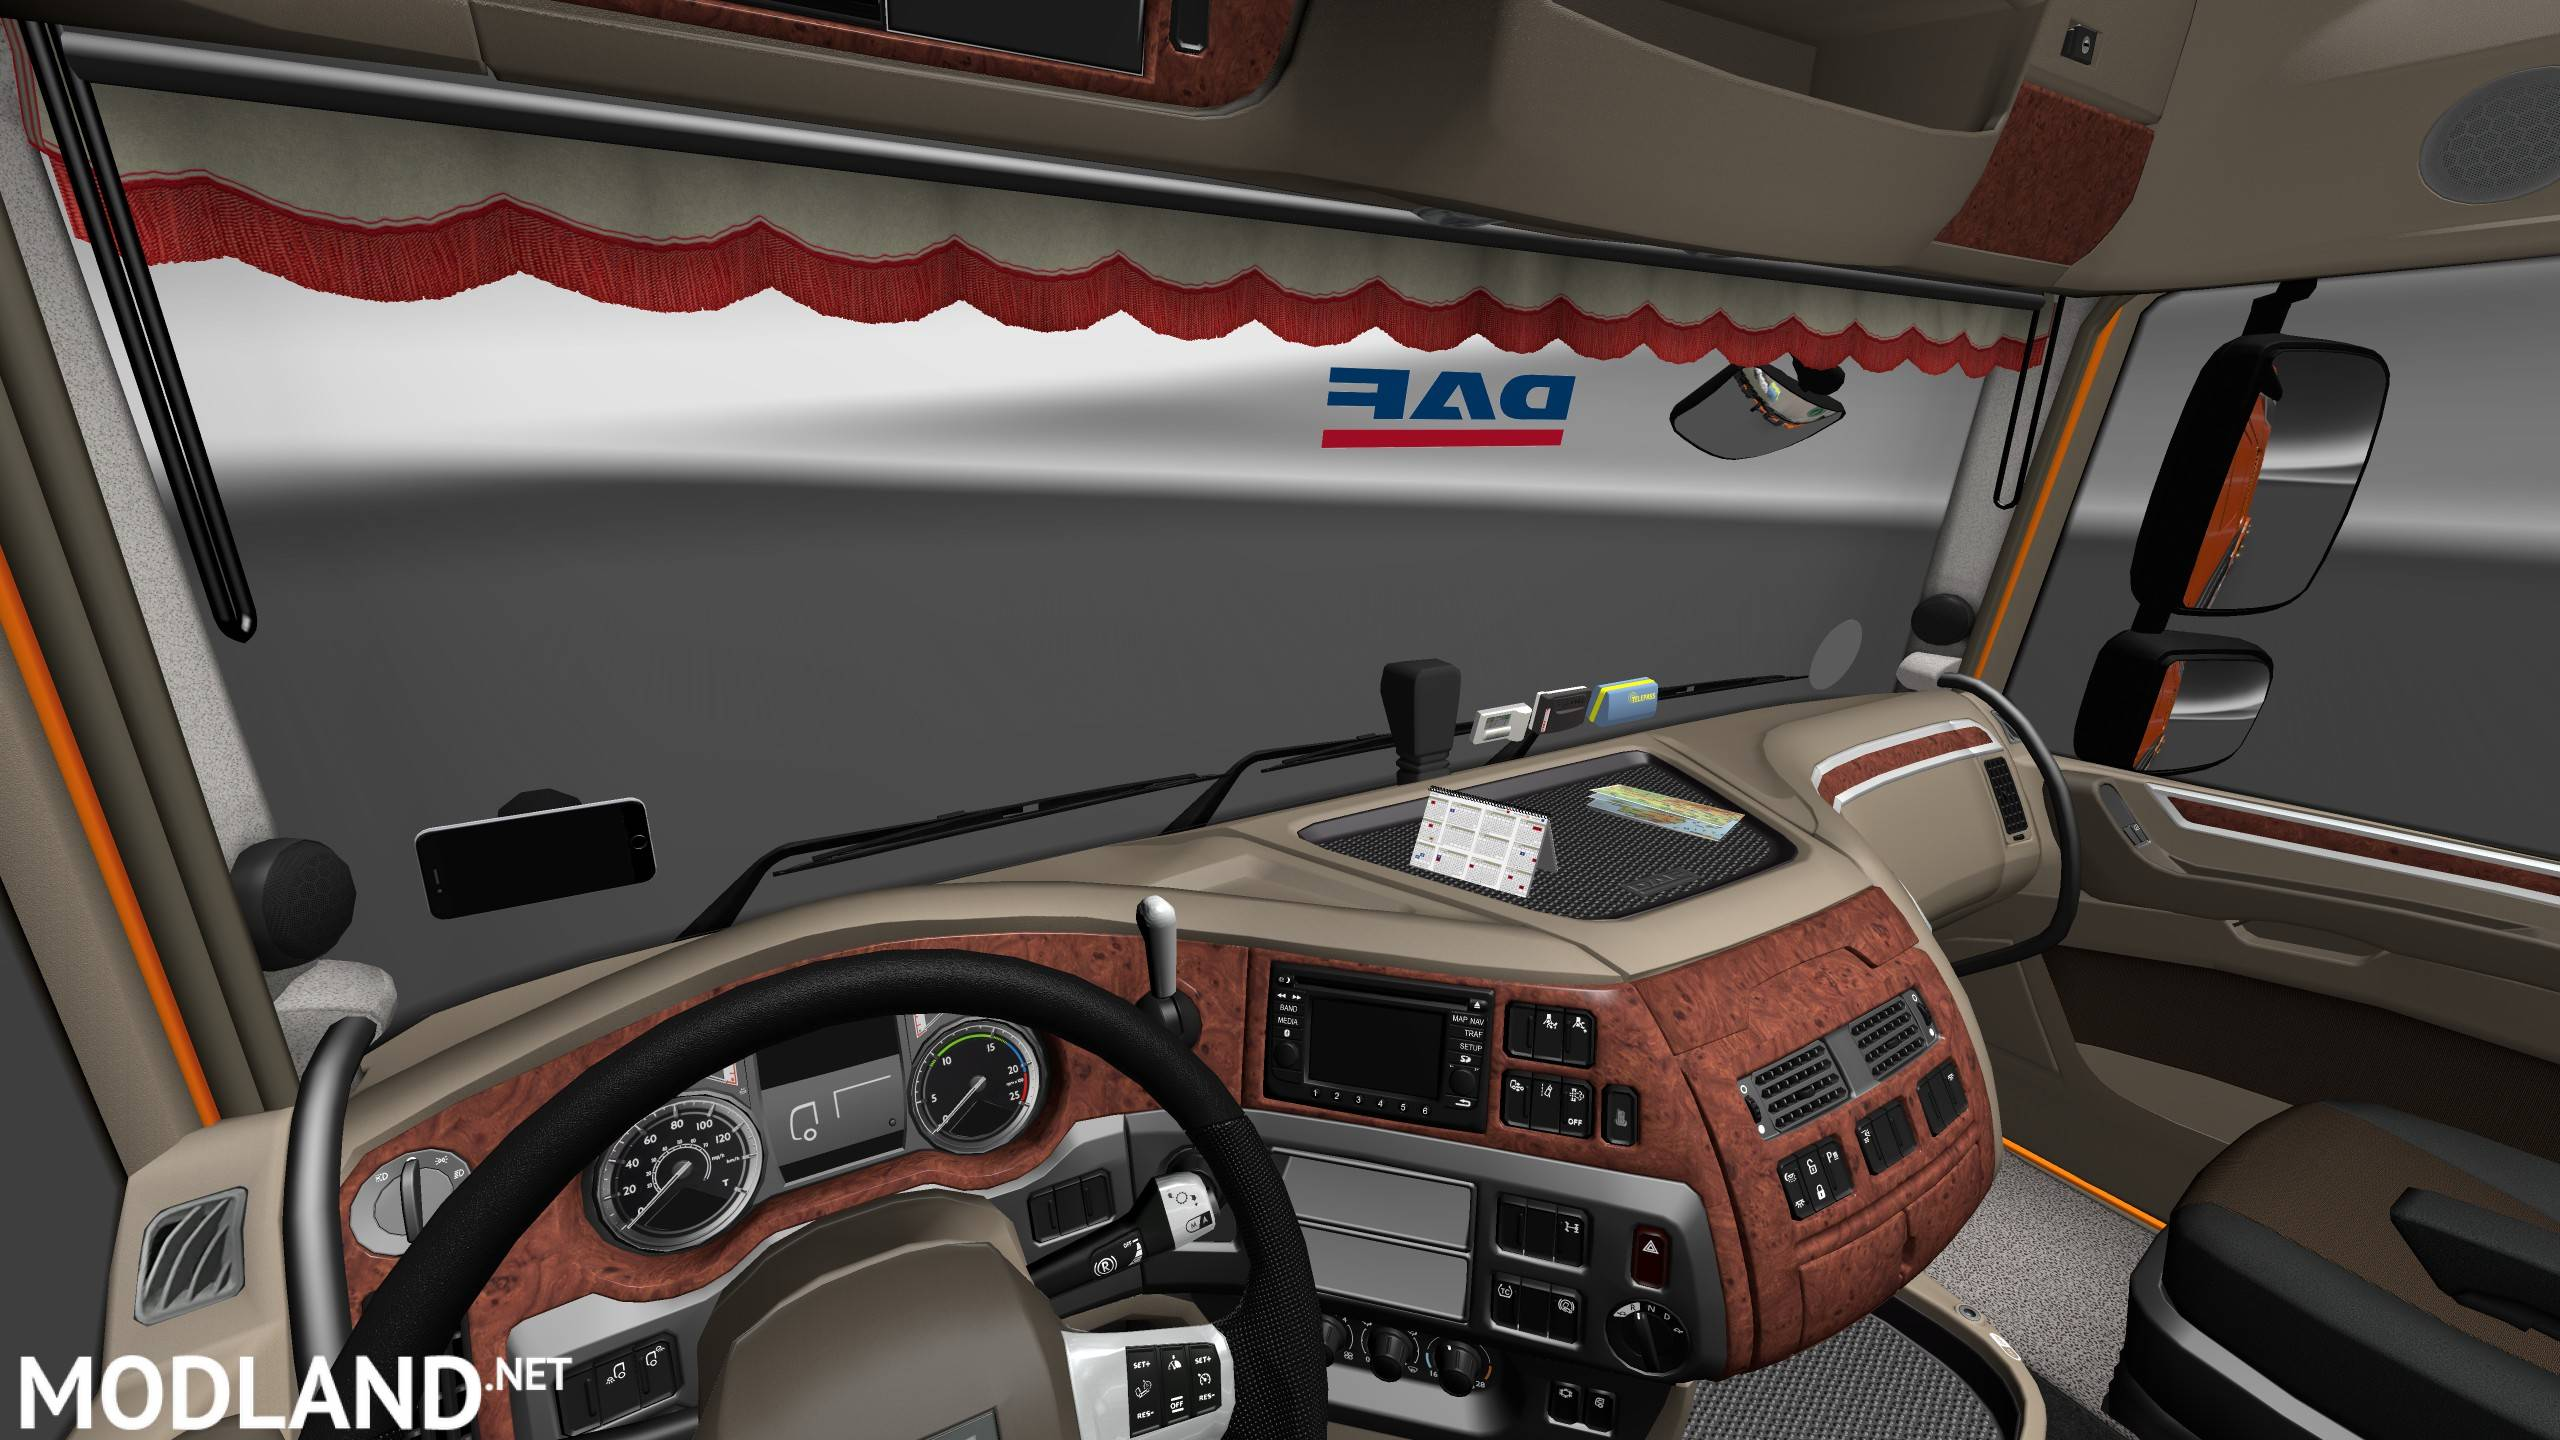 Daf Xf Euro 6 Interior Exterior Rework Ver 1 1 Ohaha S